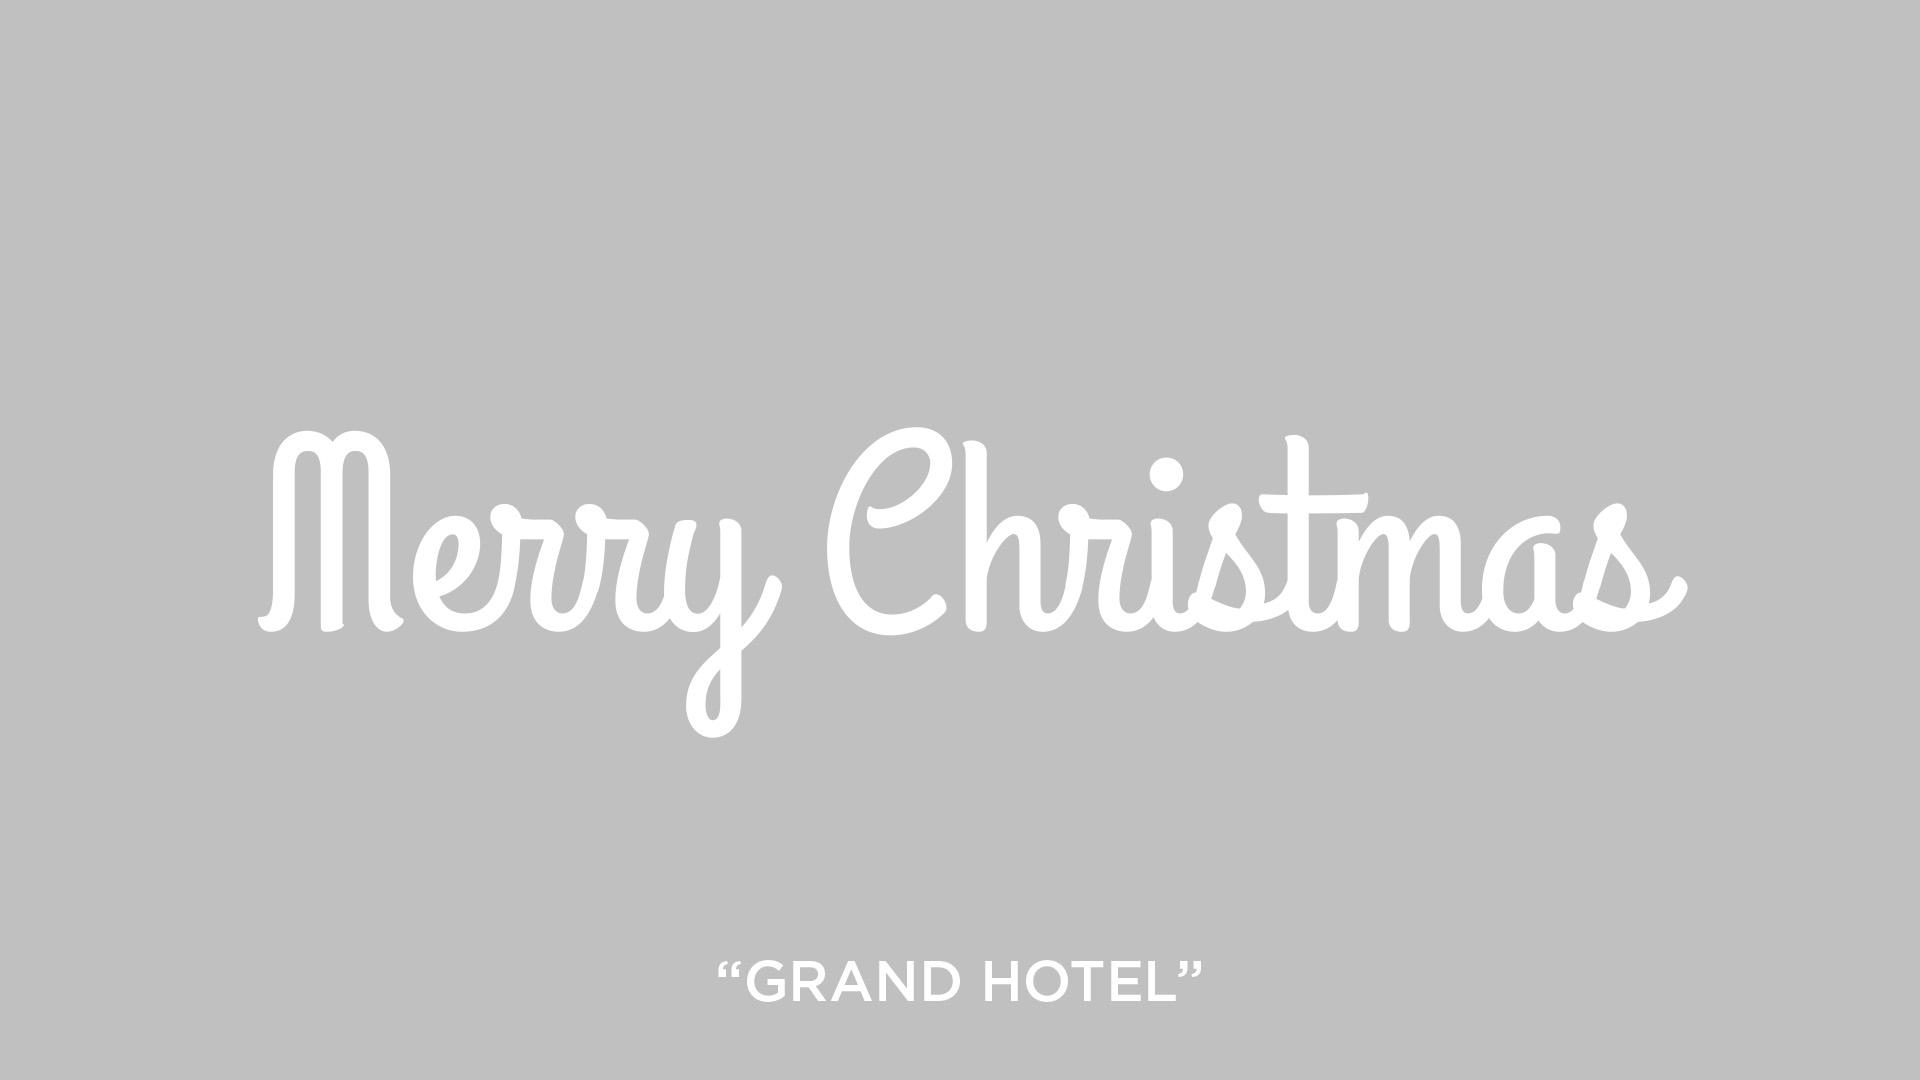 tcp-christmas_fonts-grand_hotel